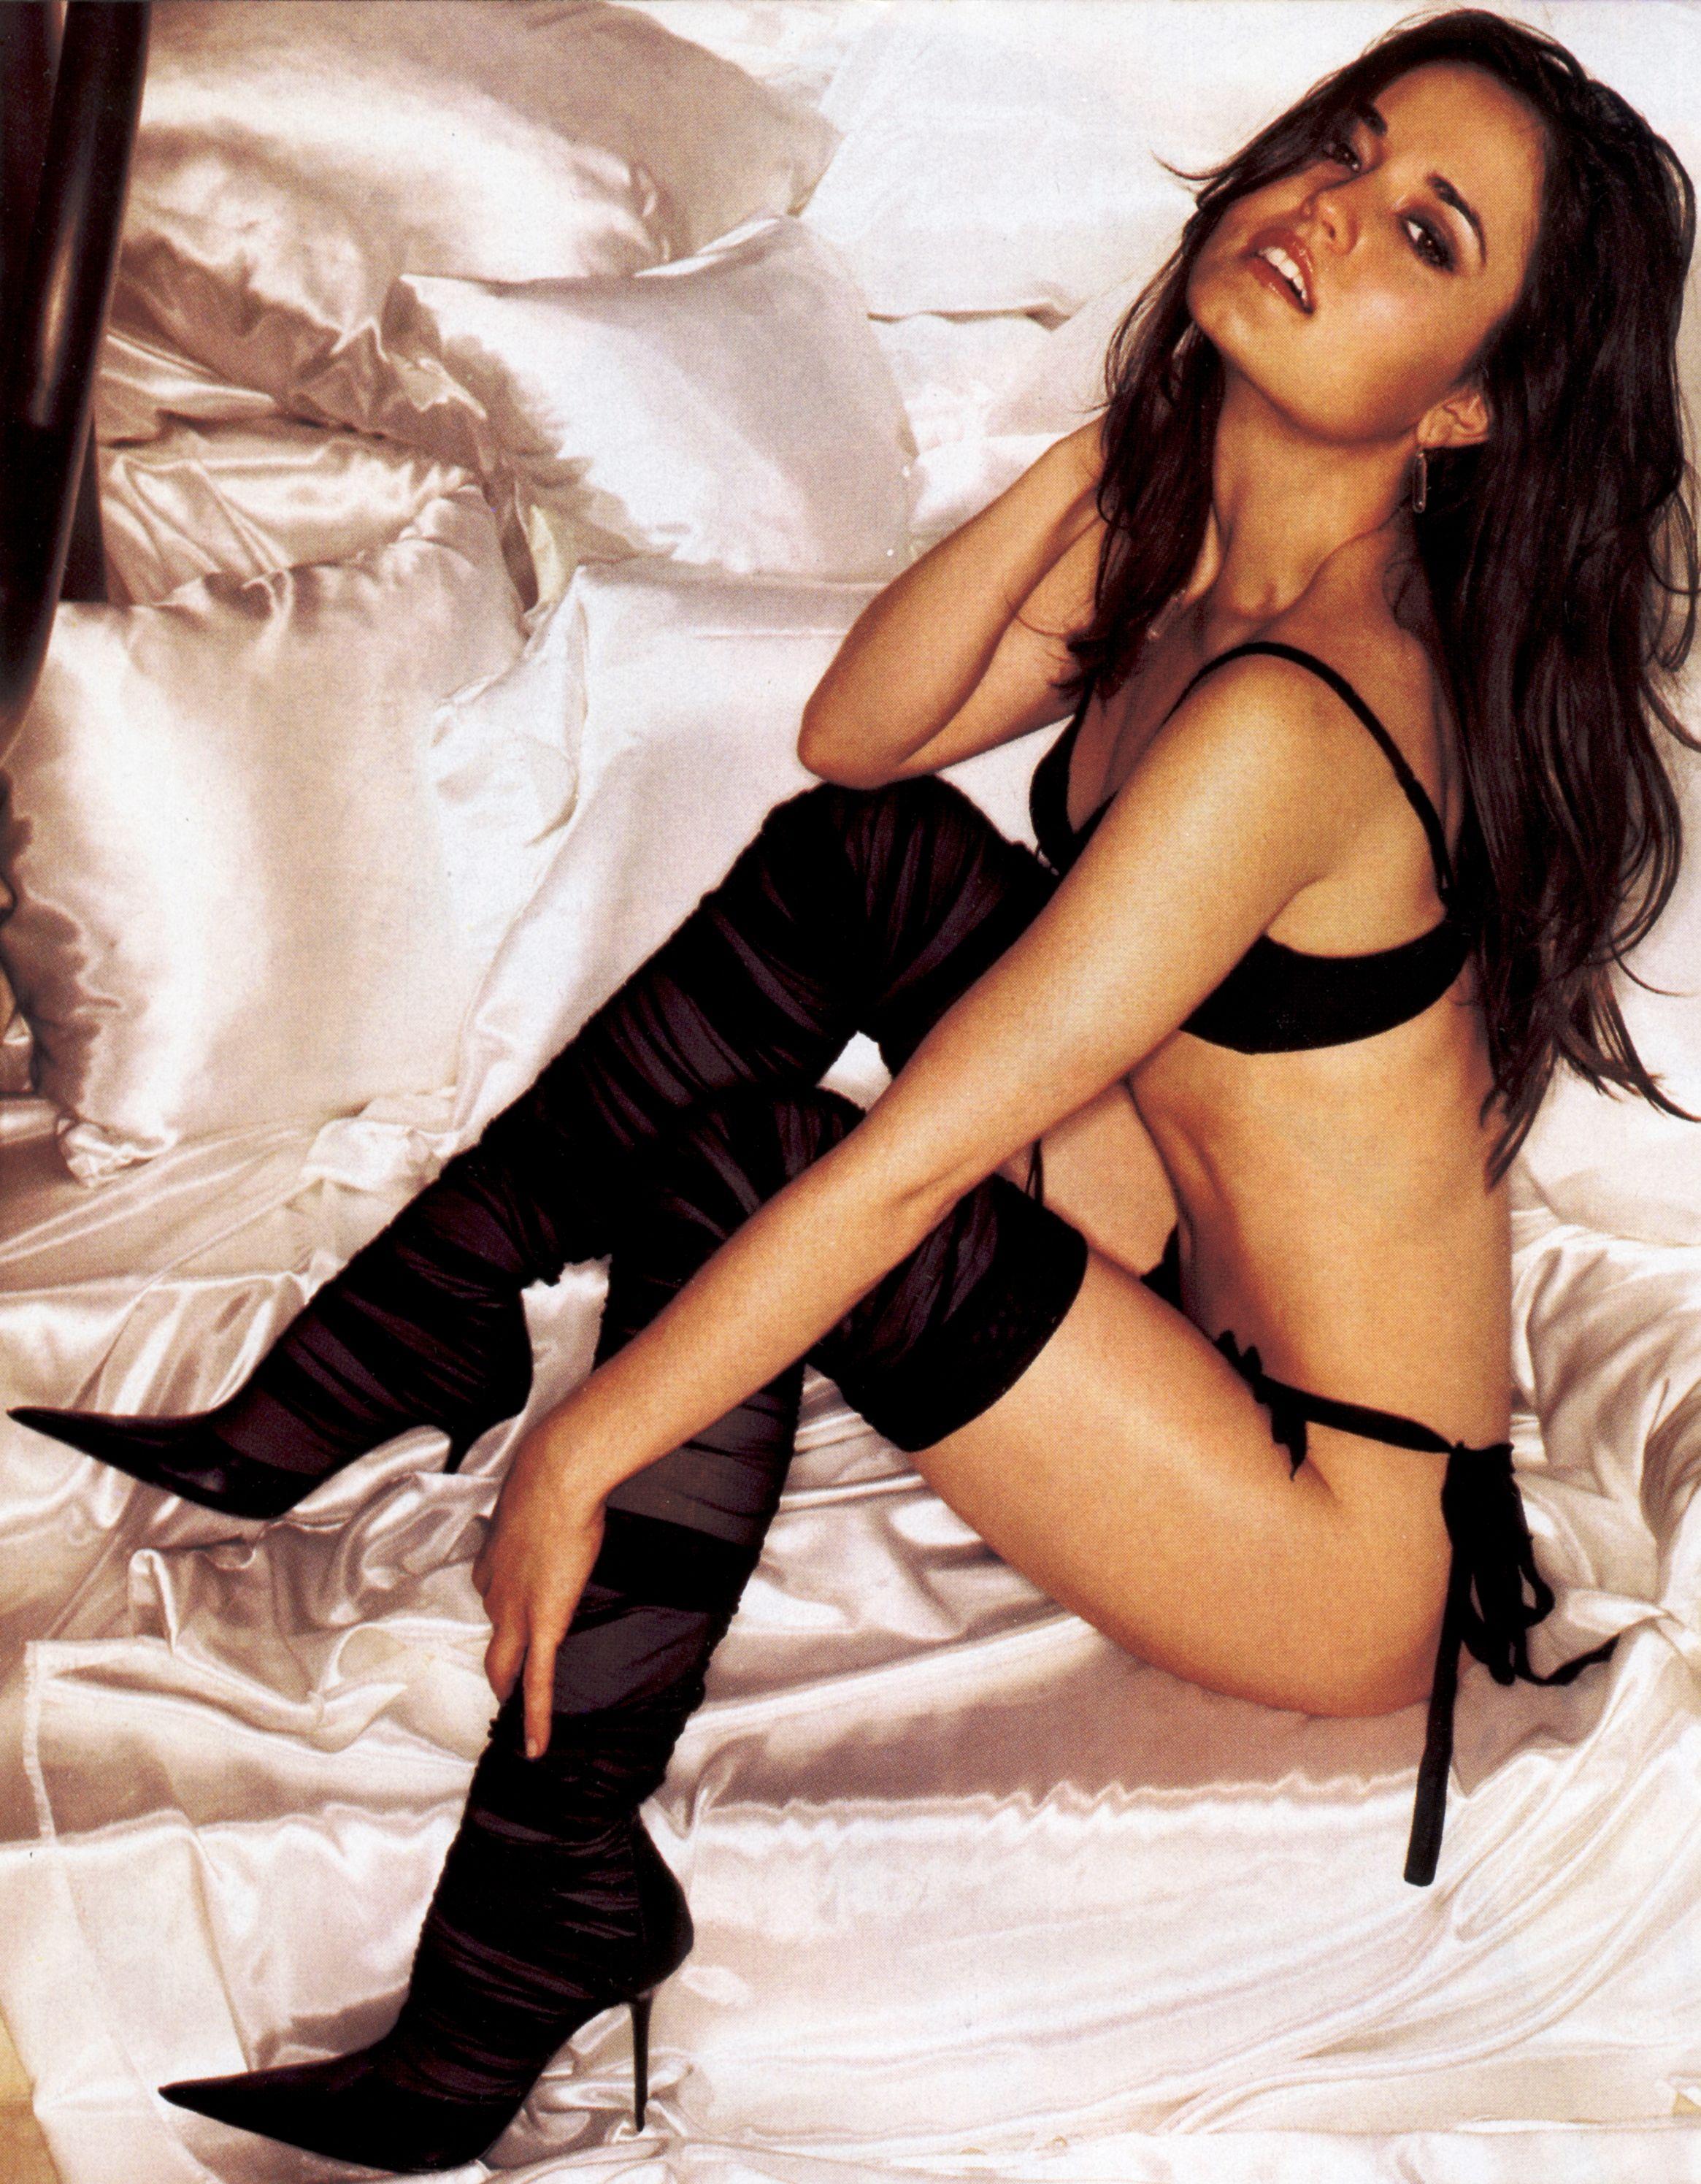 Danica mckellar sexy photos